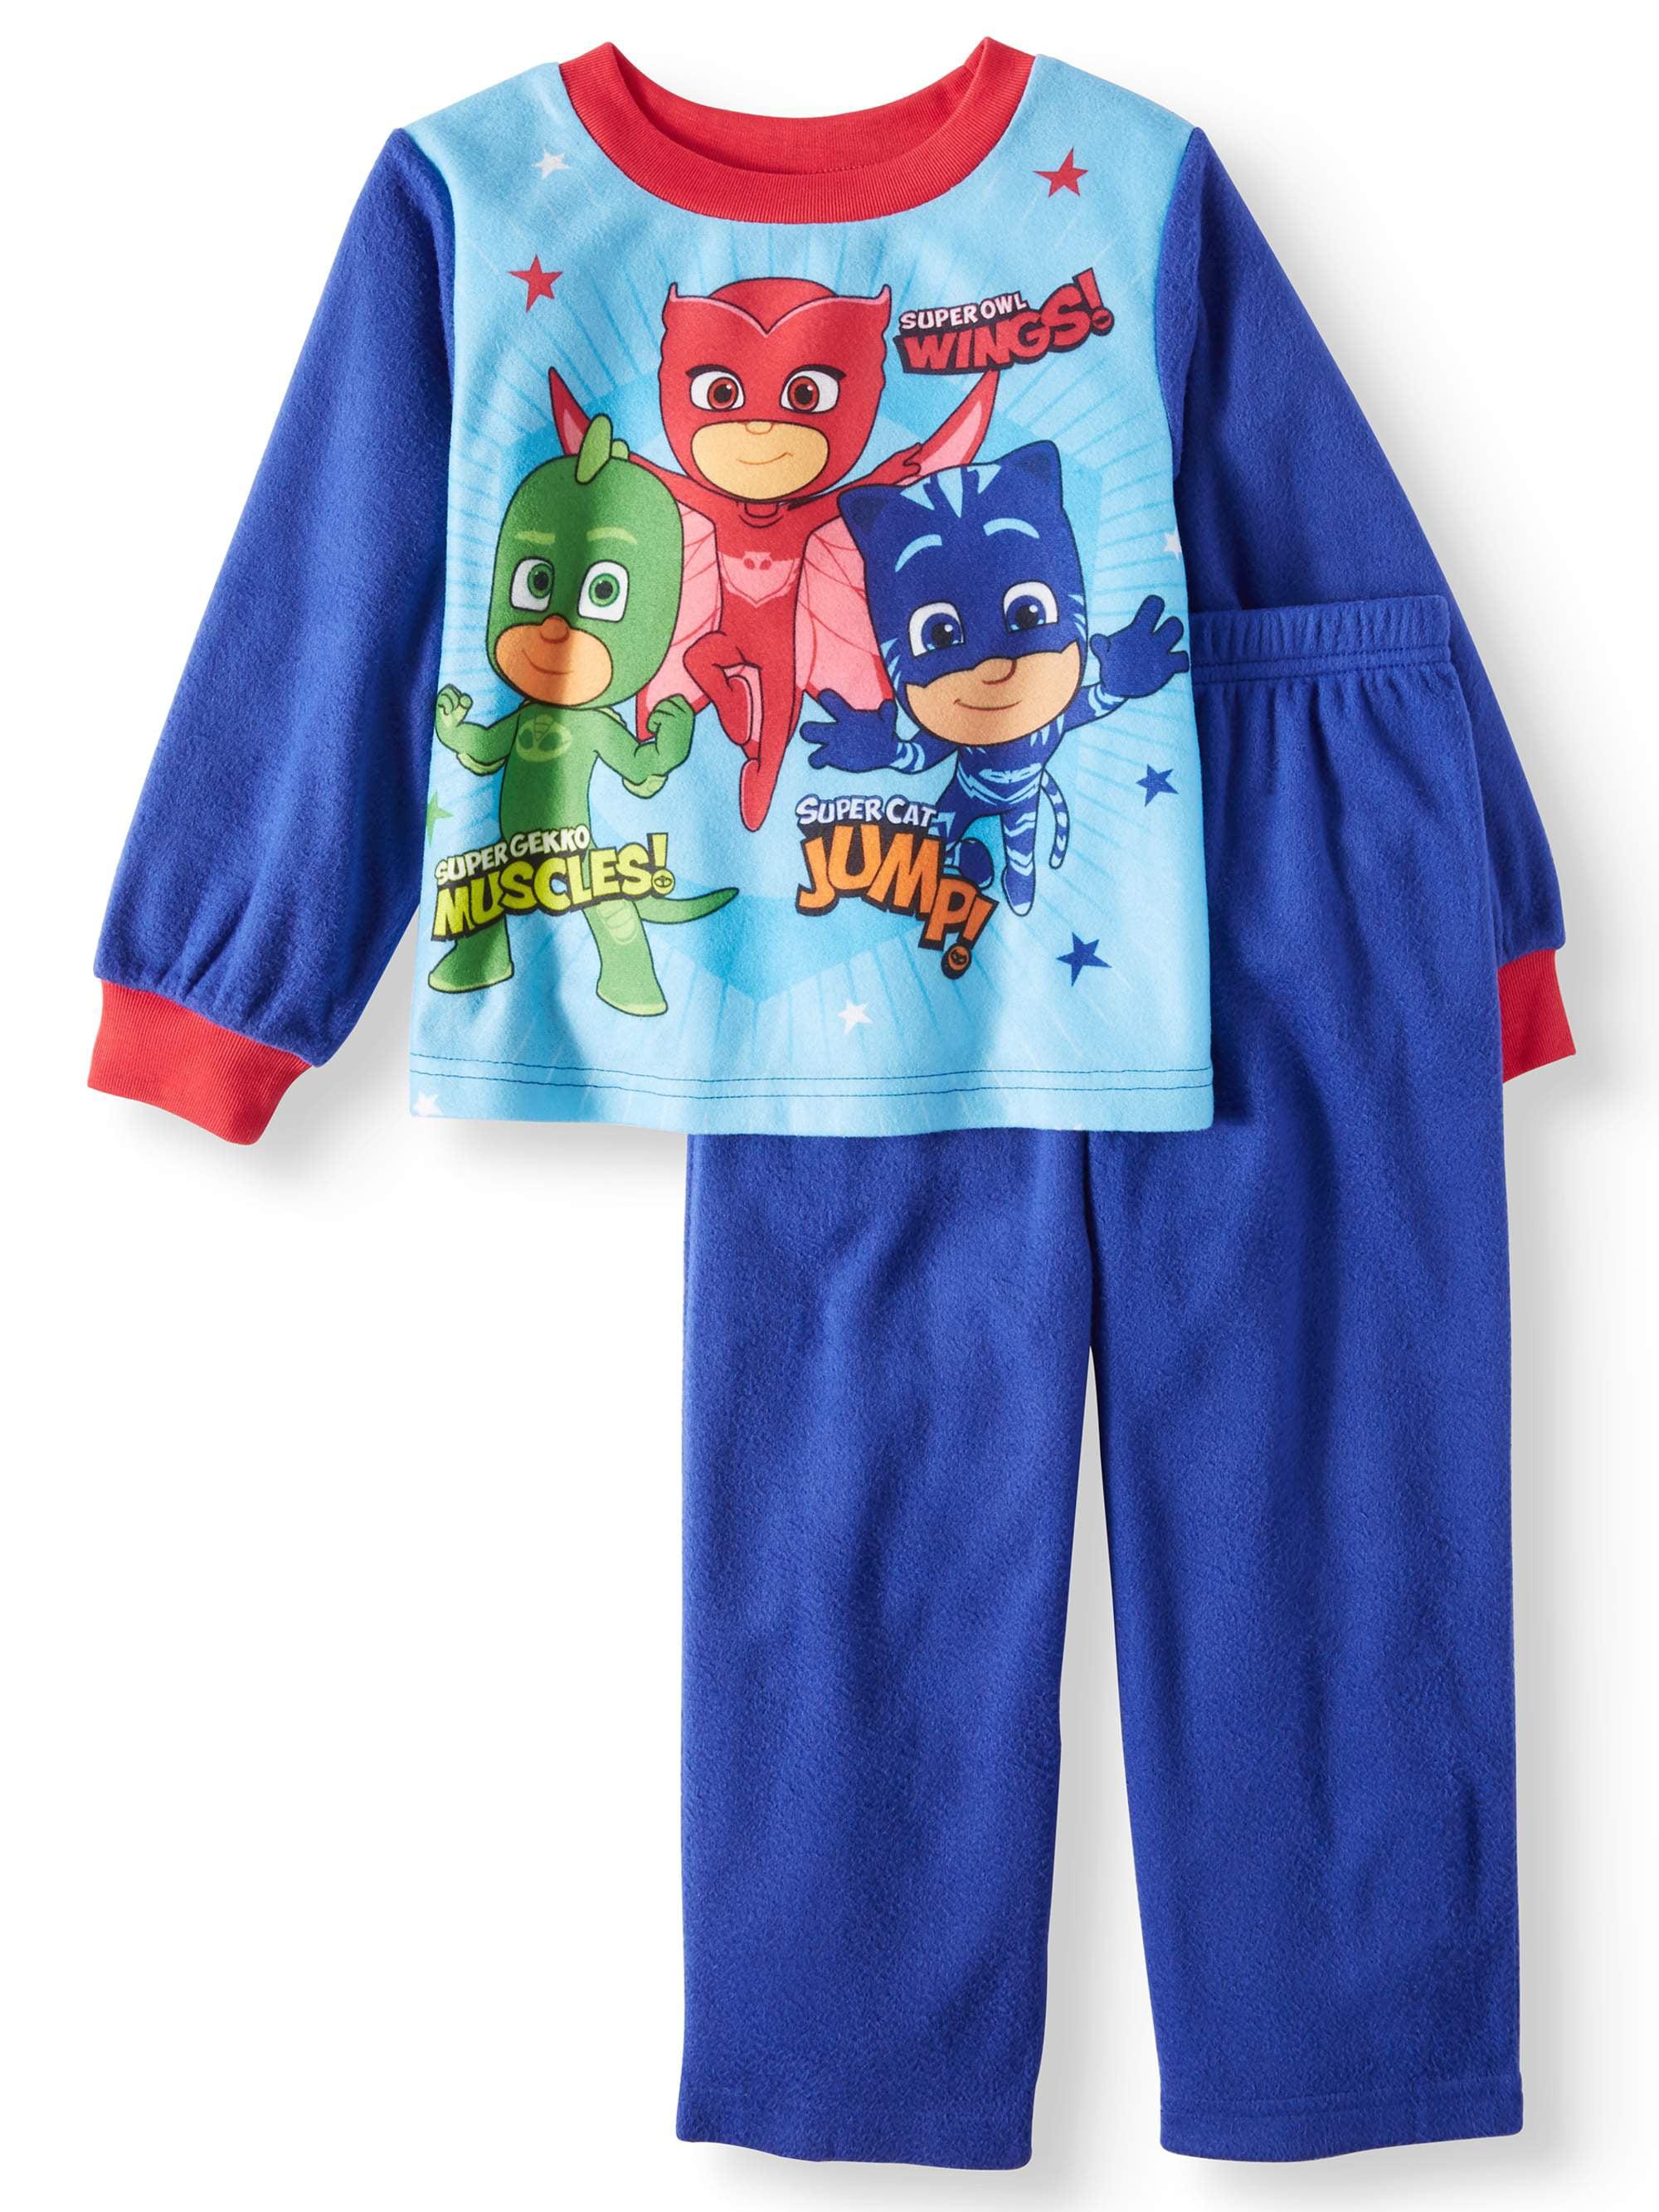 6443ffad67e6 Pj Masks Pajamas